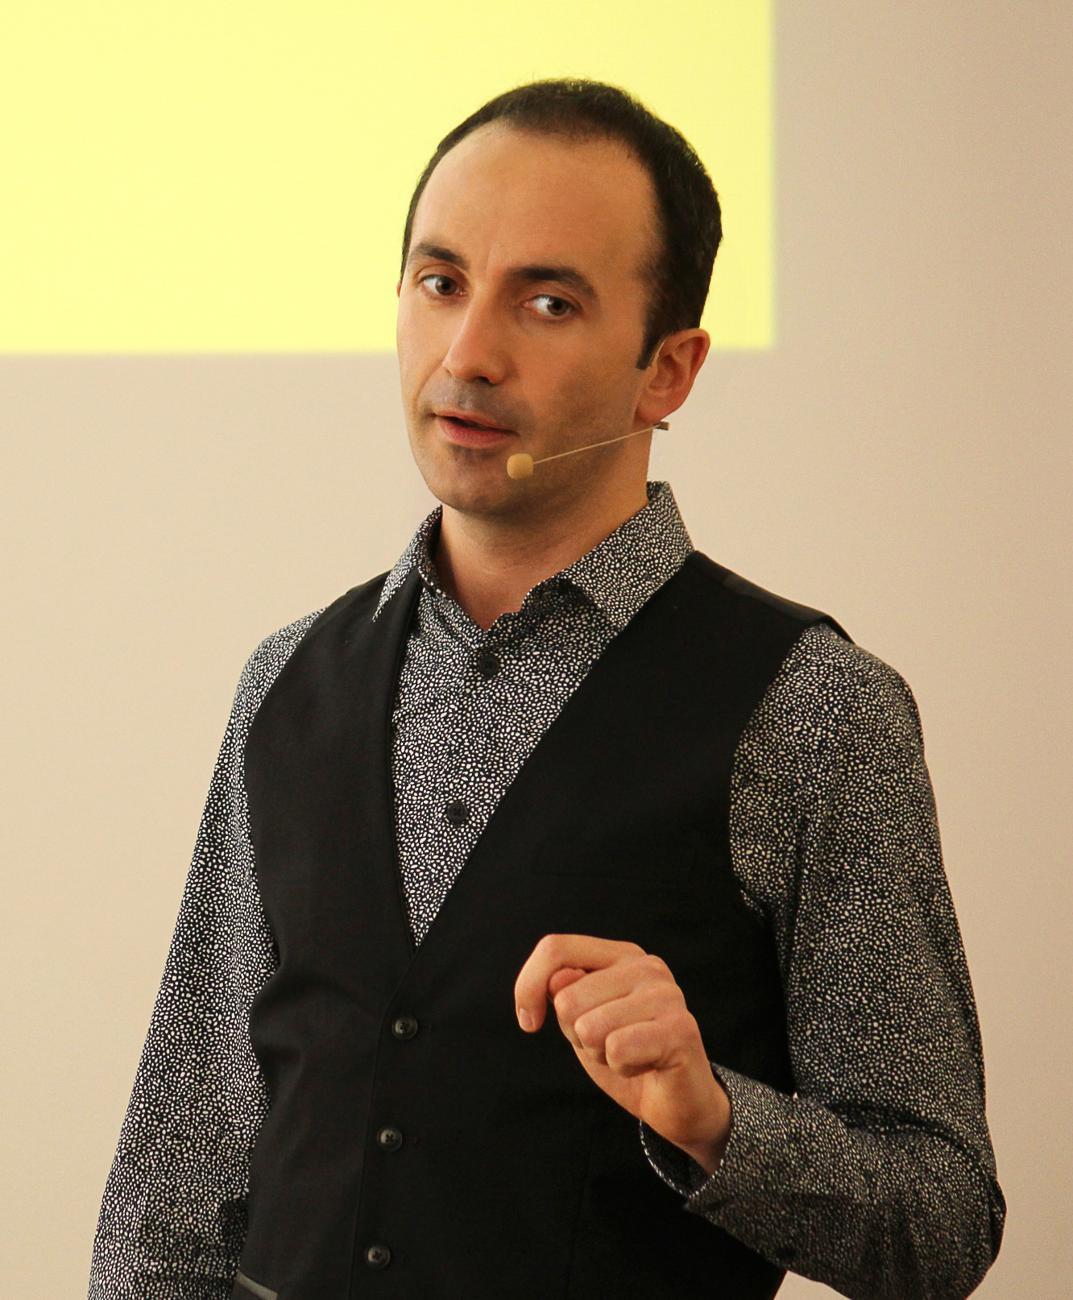 Mirko Montini